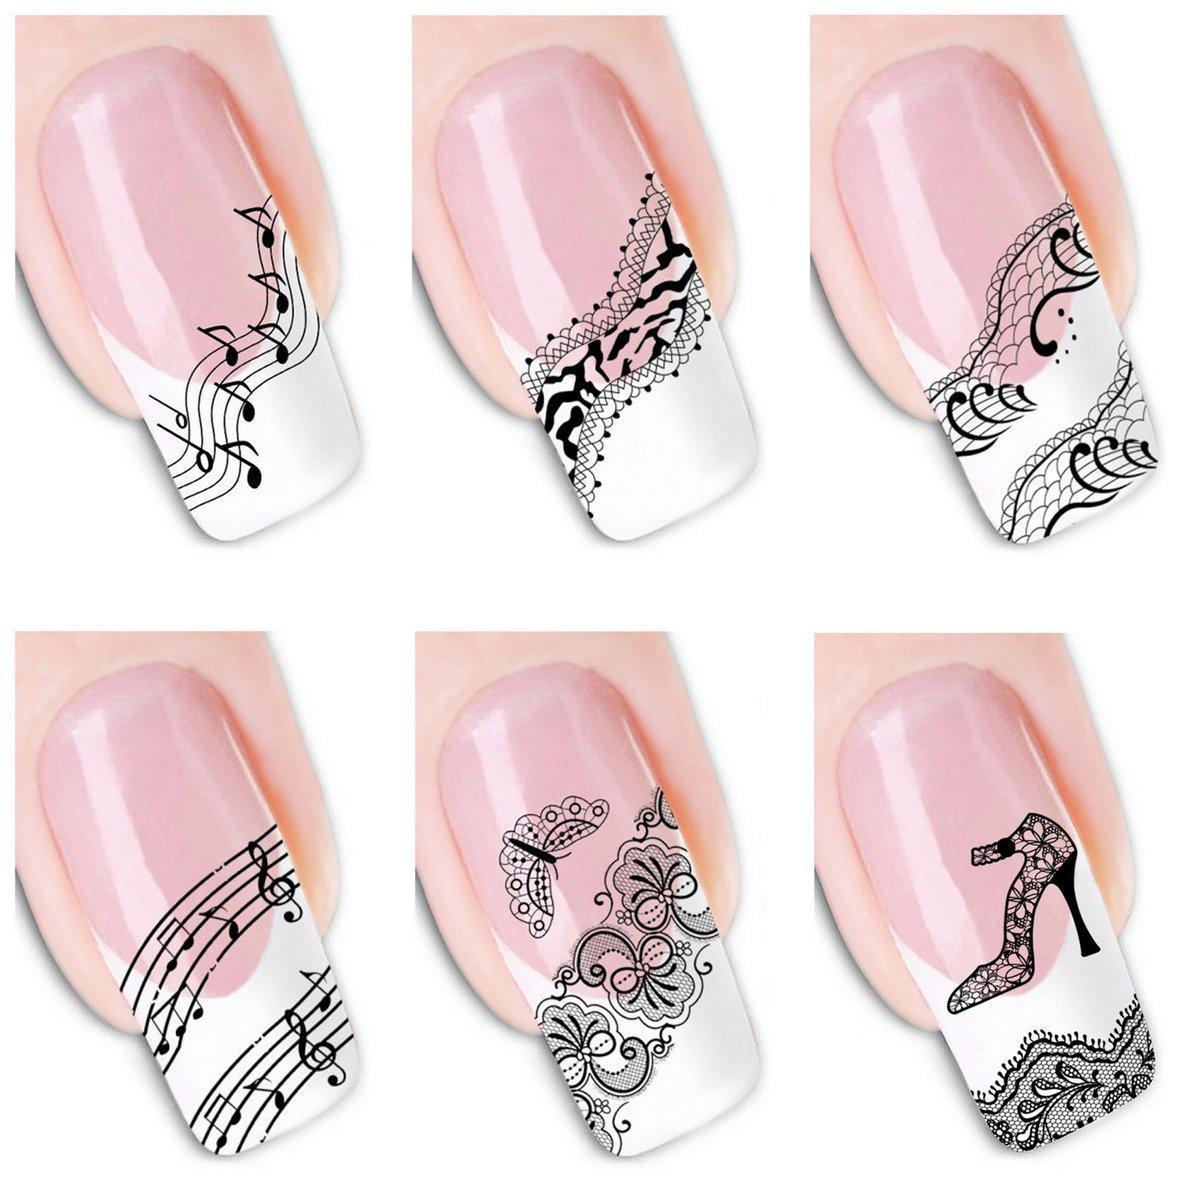 Amazon.com : 6Pcs Different Designs Nail Art Sticker Lace Music ...